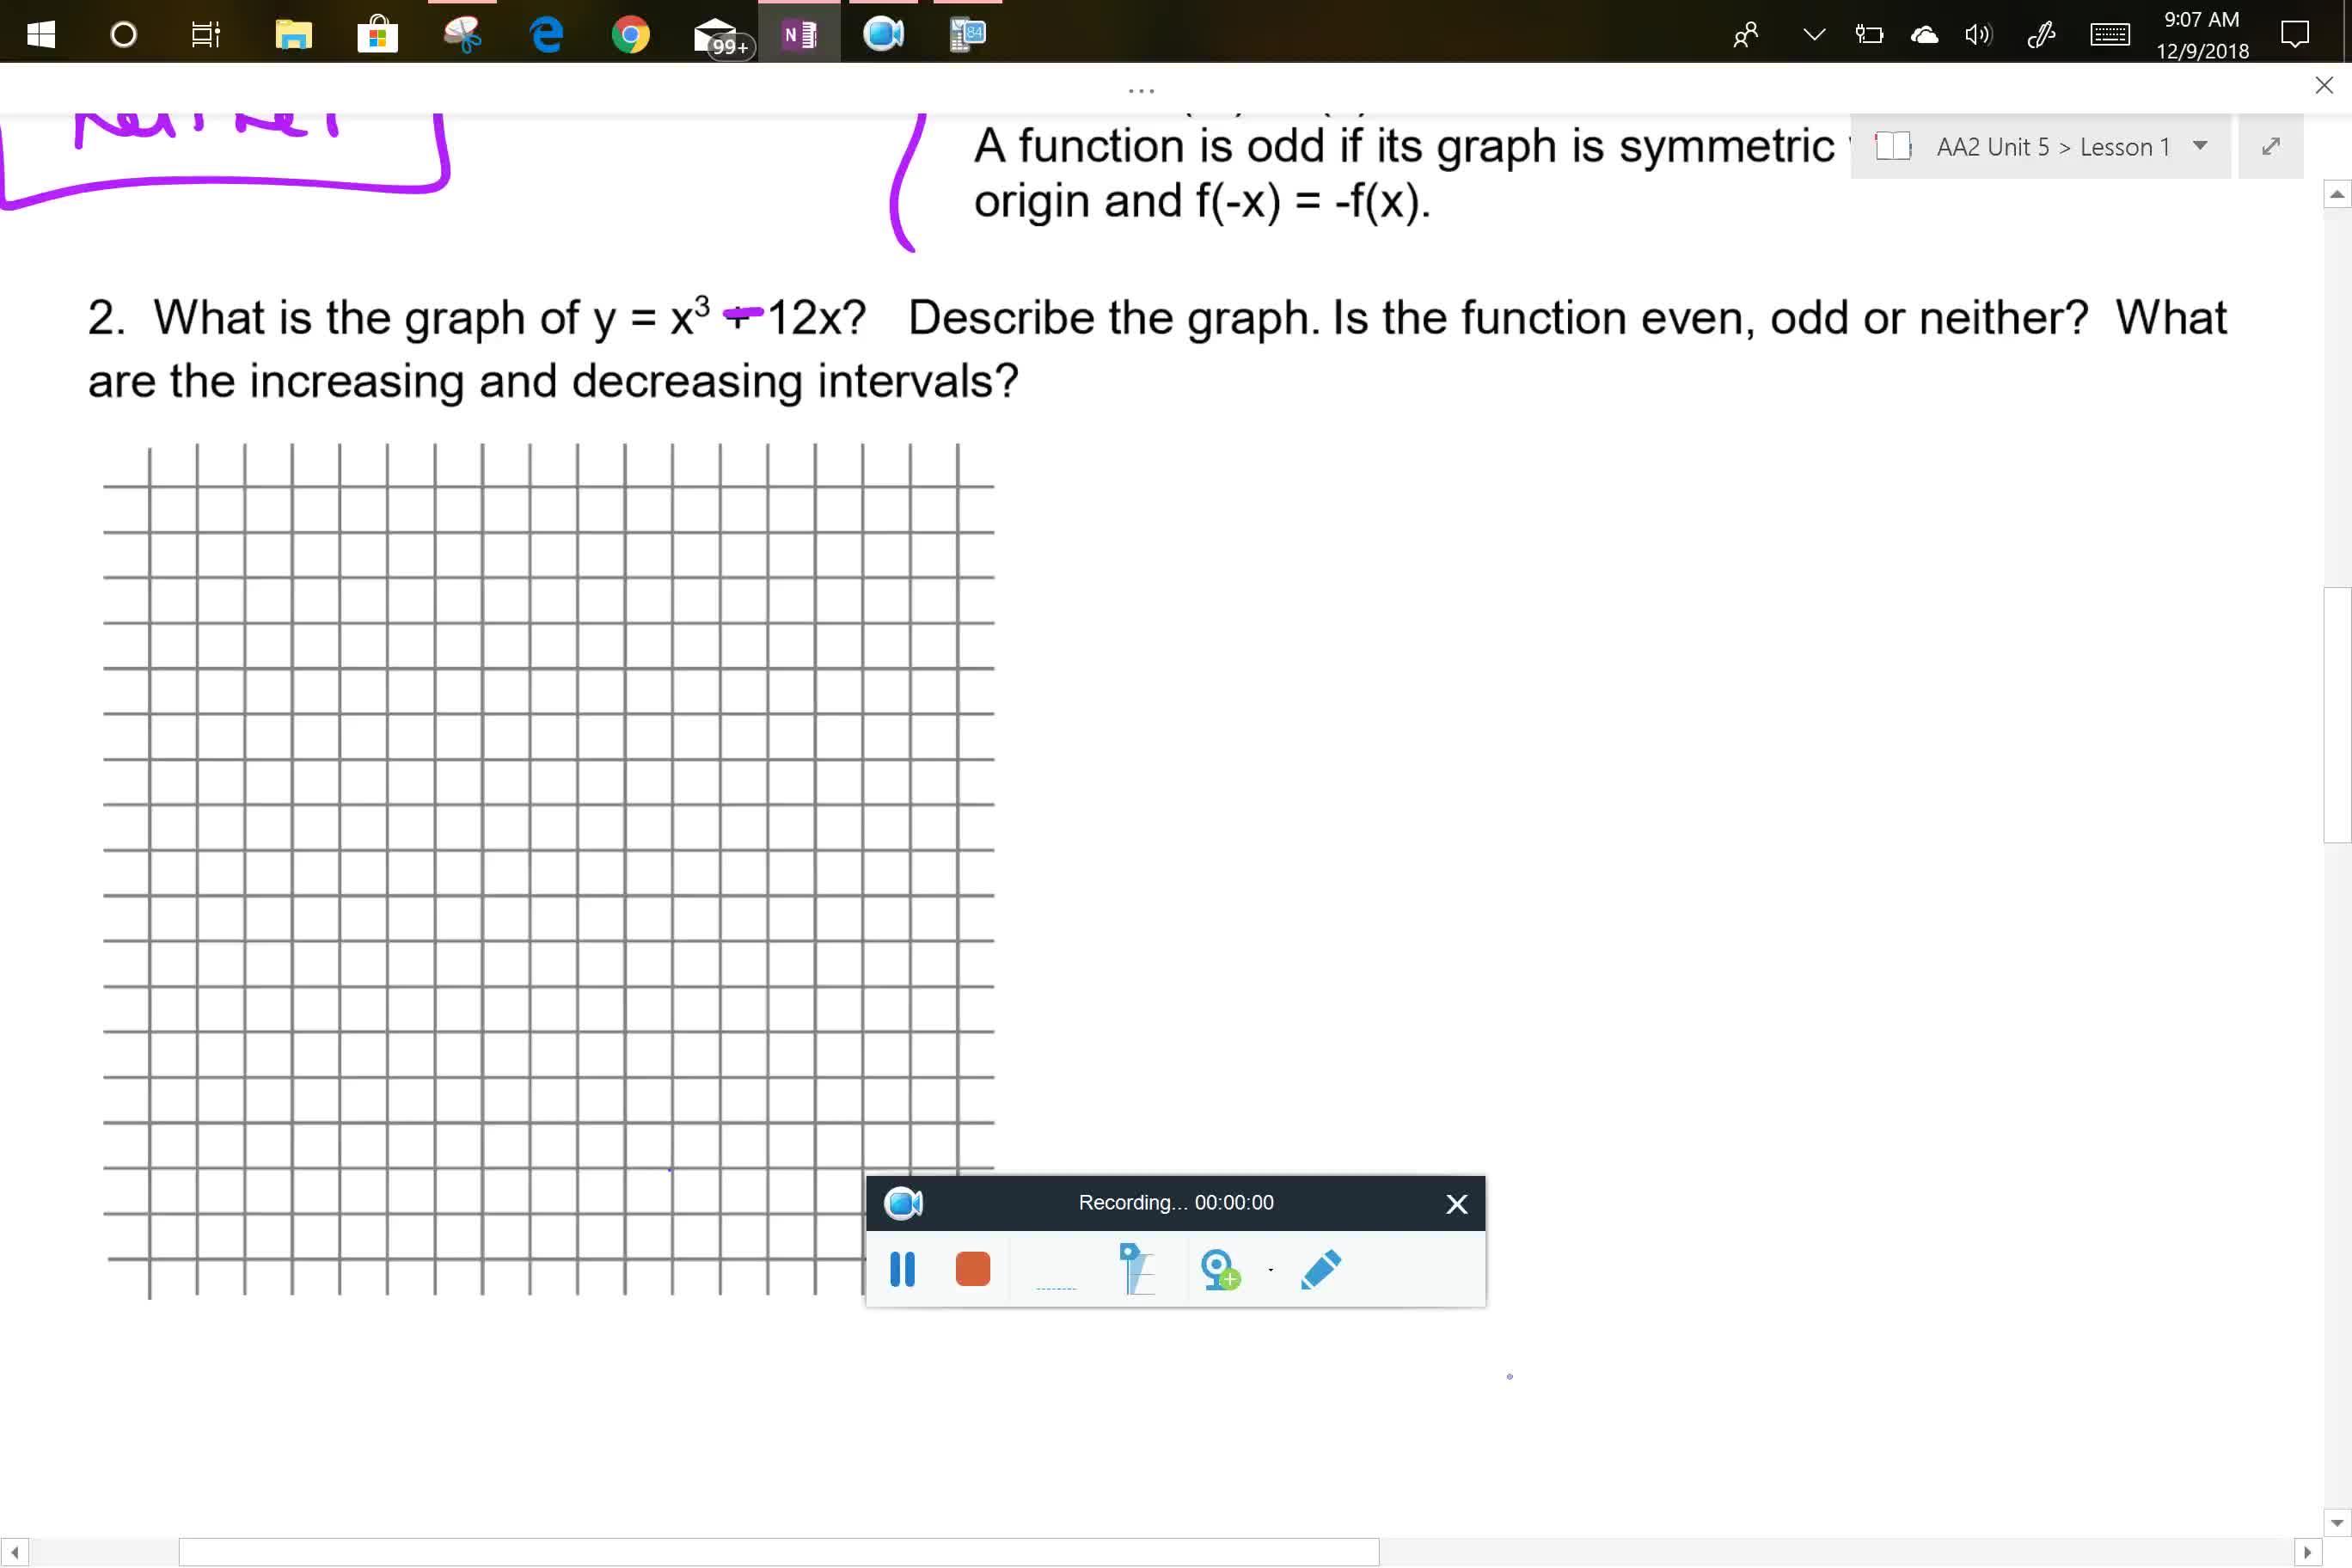 AA2 U5L1 Problem 2 part 1